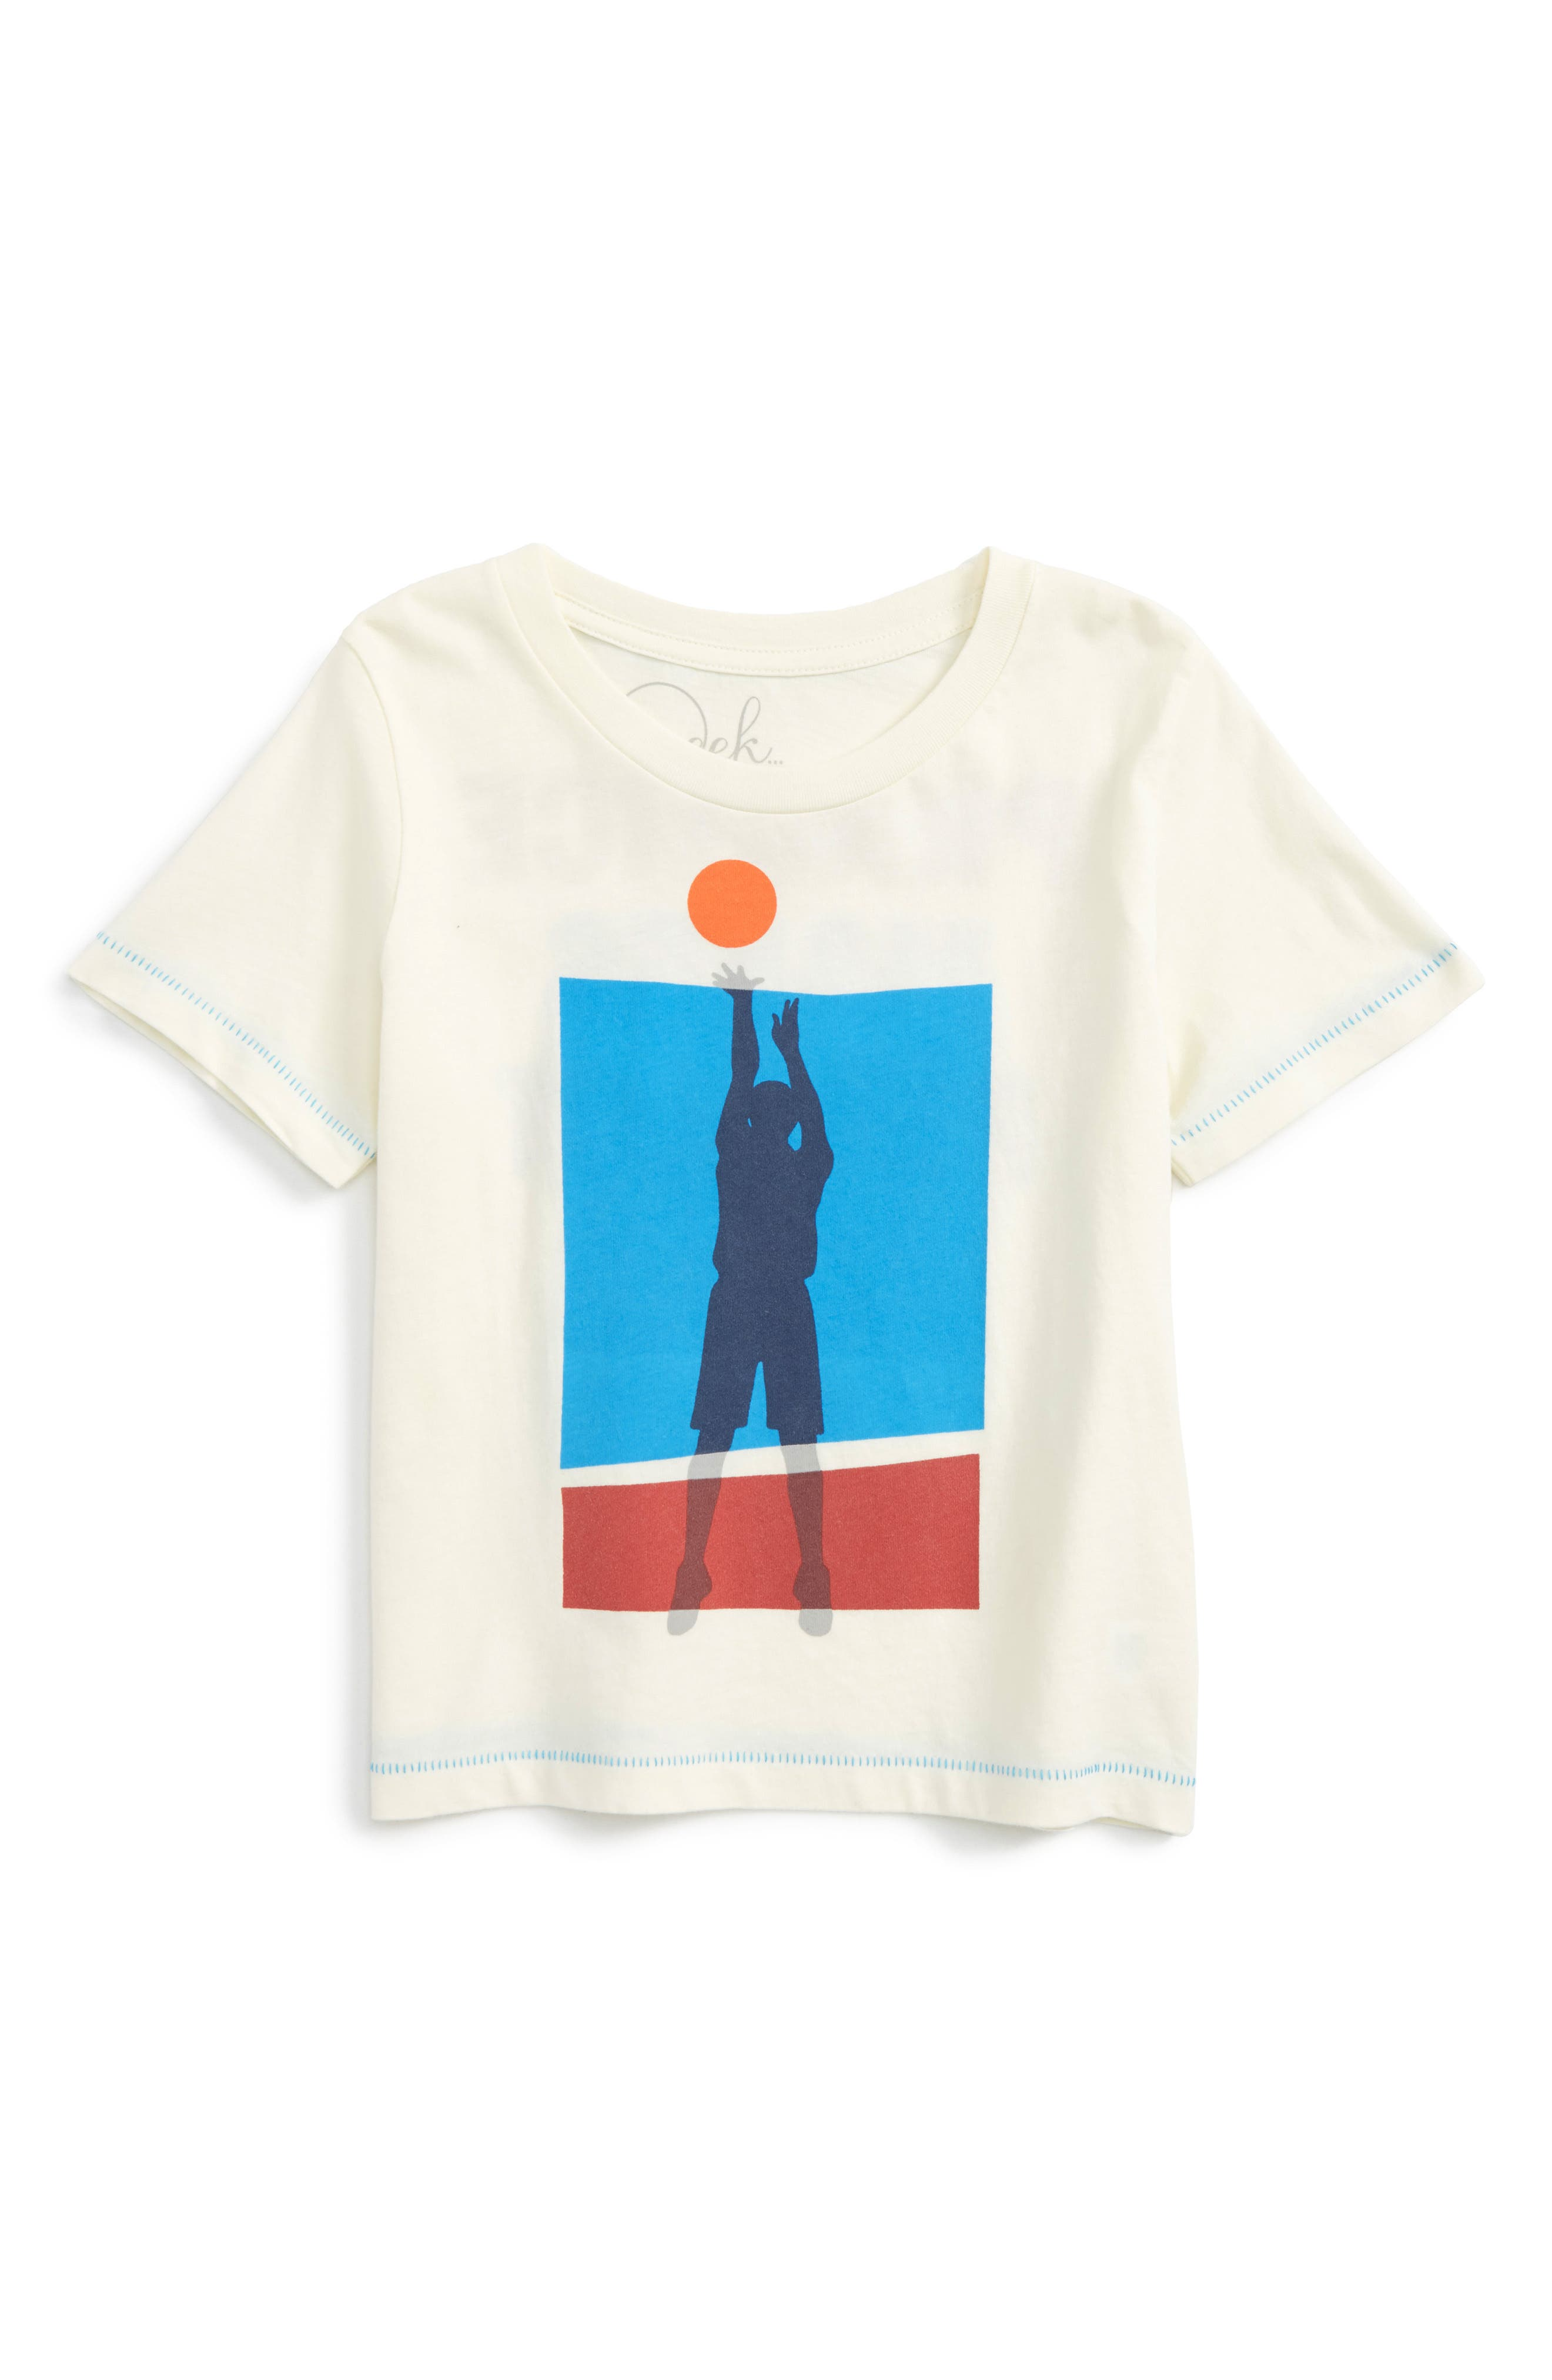 Basketball Practice T-Shirt,                             Main thumbnail 1, color,                             906